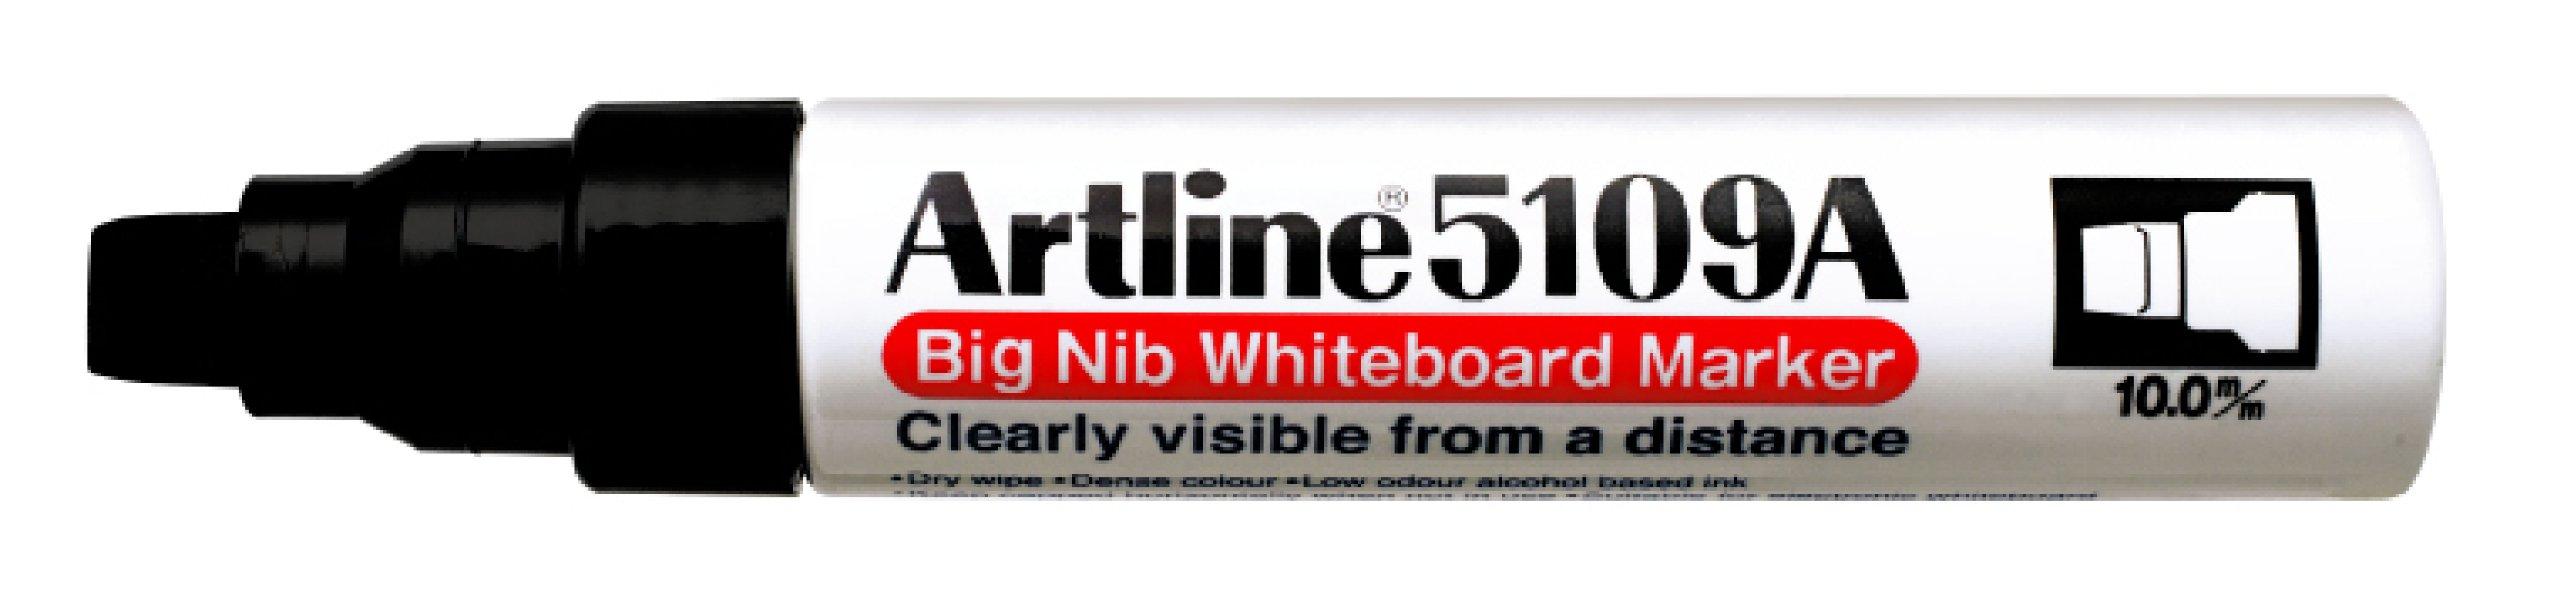 Artline 5109A Big Nib Extra Large Jumbo Dry Erase Whiteboard Markers (BLACK, Pack of 6) by Artline